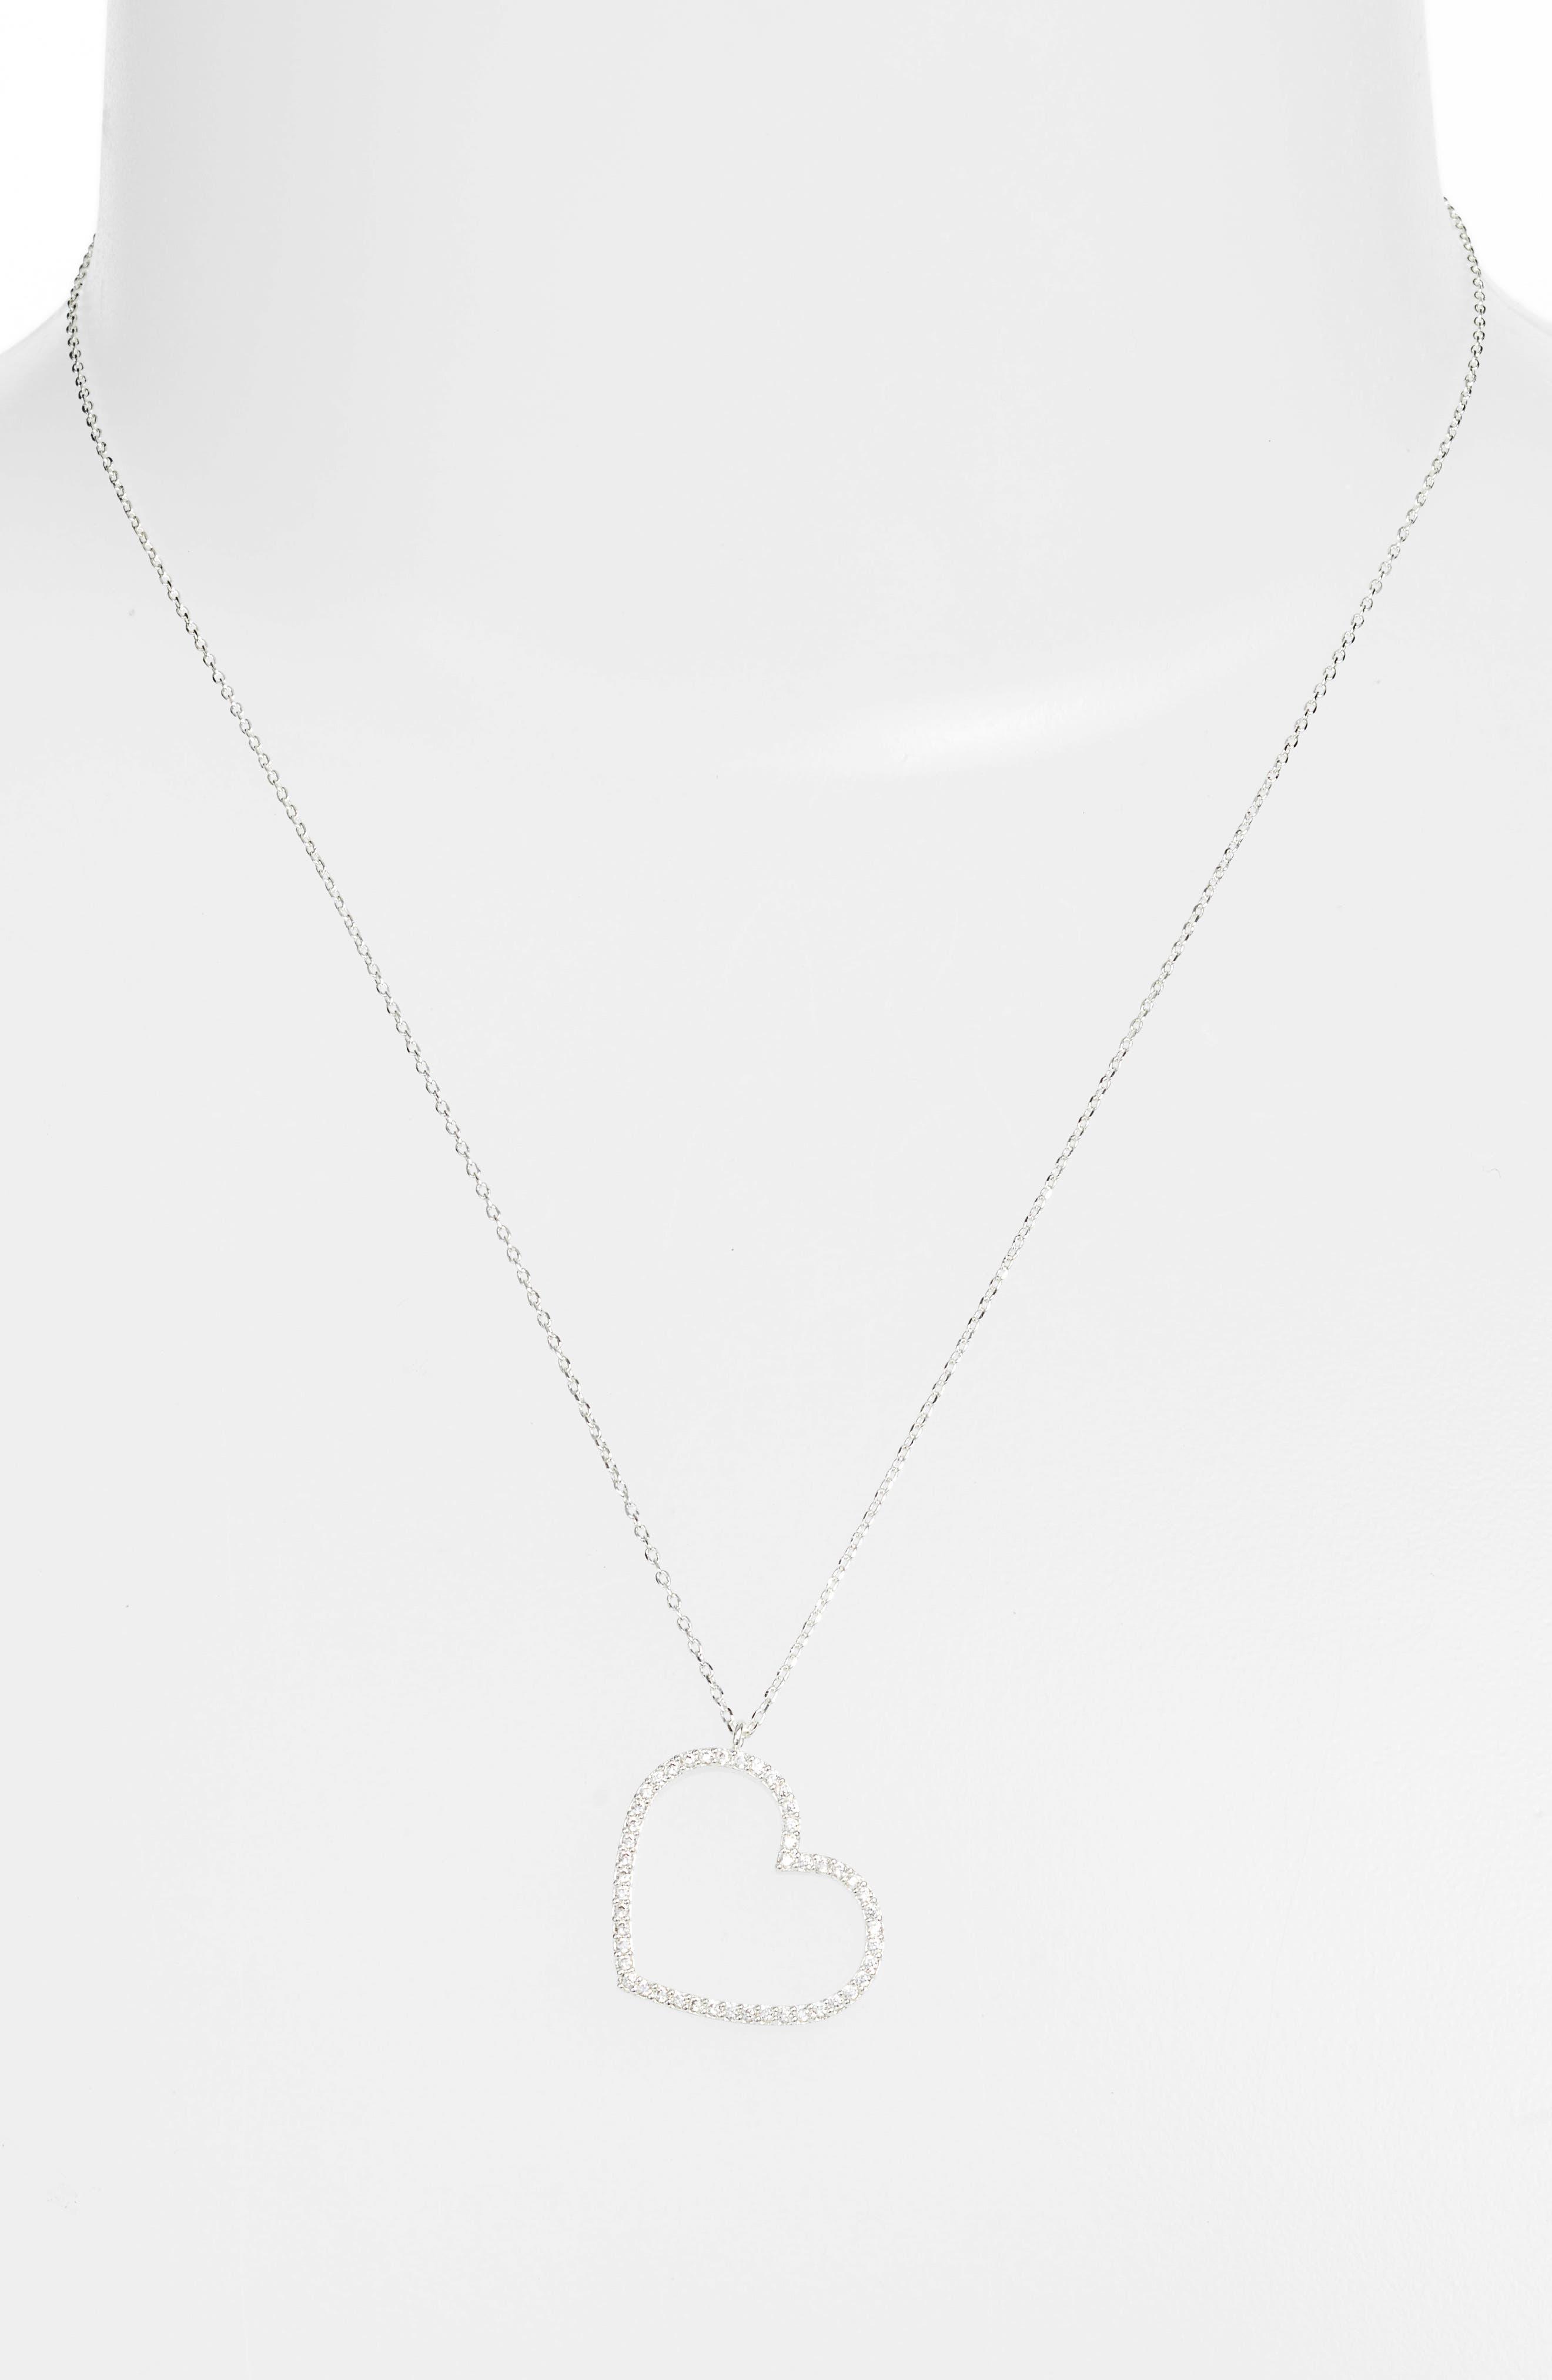 Cubic Zirconia Heart Necklace,                             Alternate thumbnail 2, color,                             Silver